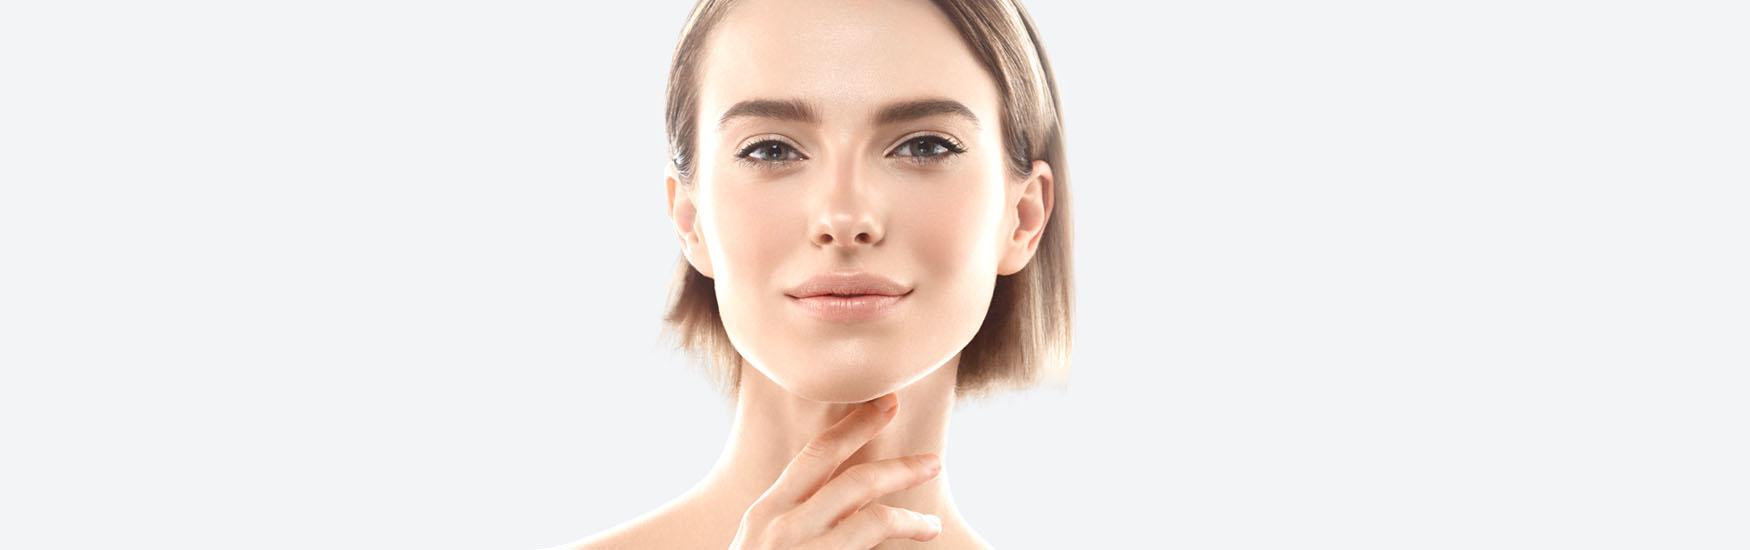 Ултразвуково почистване на лице плюс маска от студио за красота Визия Пловдив